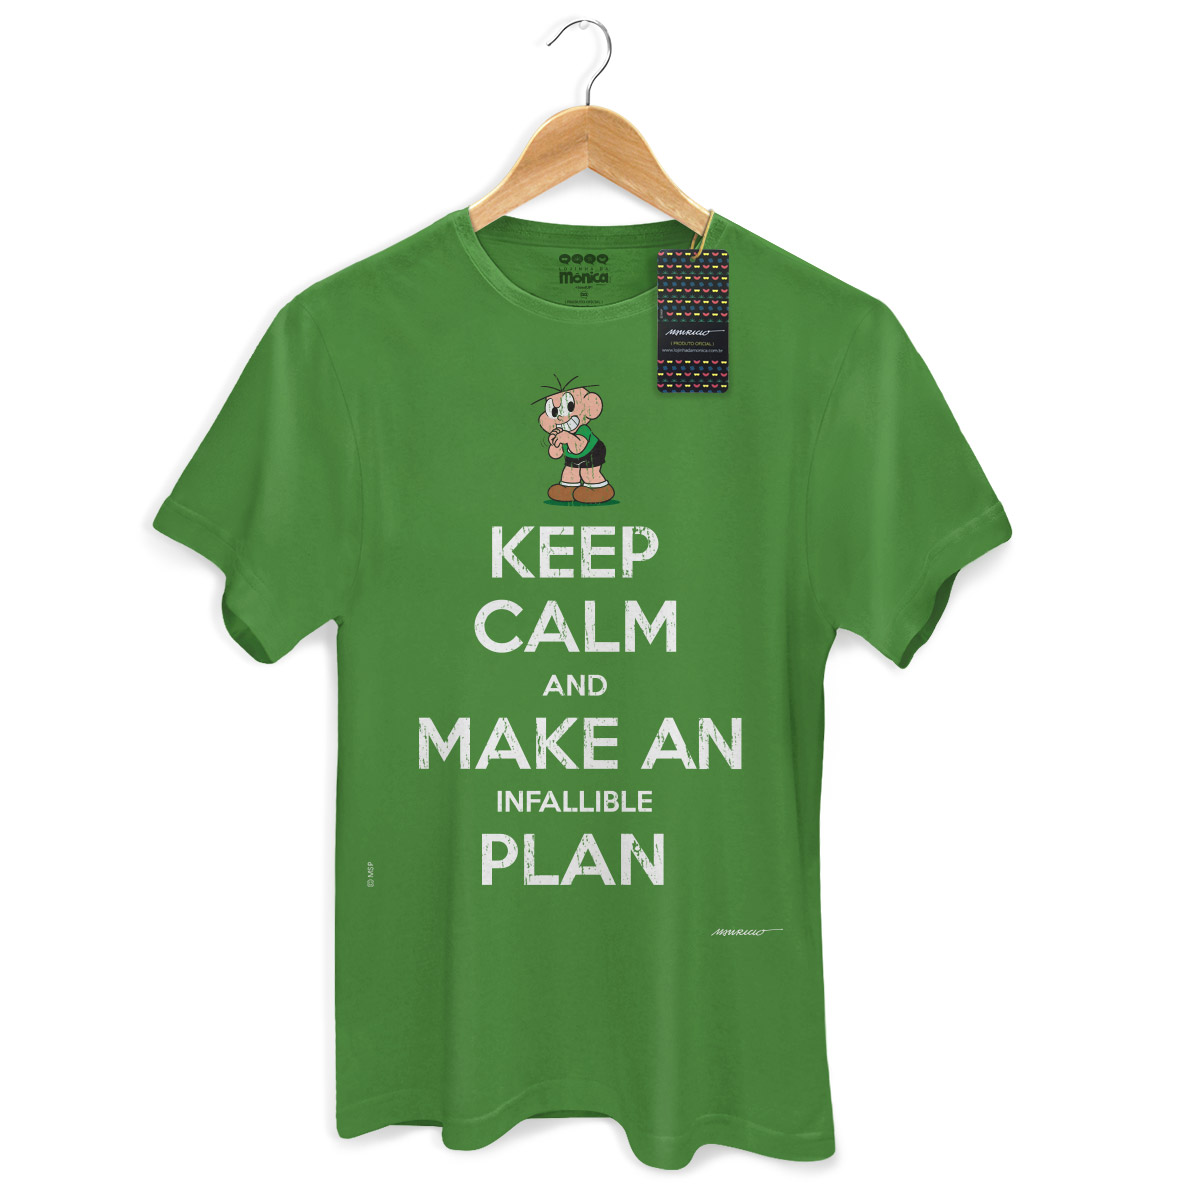 Camiseta Masculina Turma Da Mônica Cool Keep Calm And Make Infallible Plan